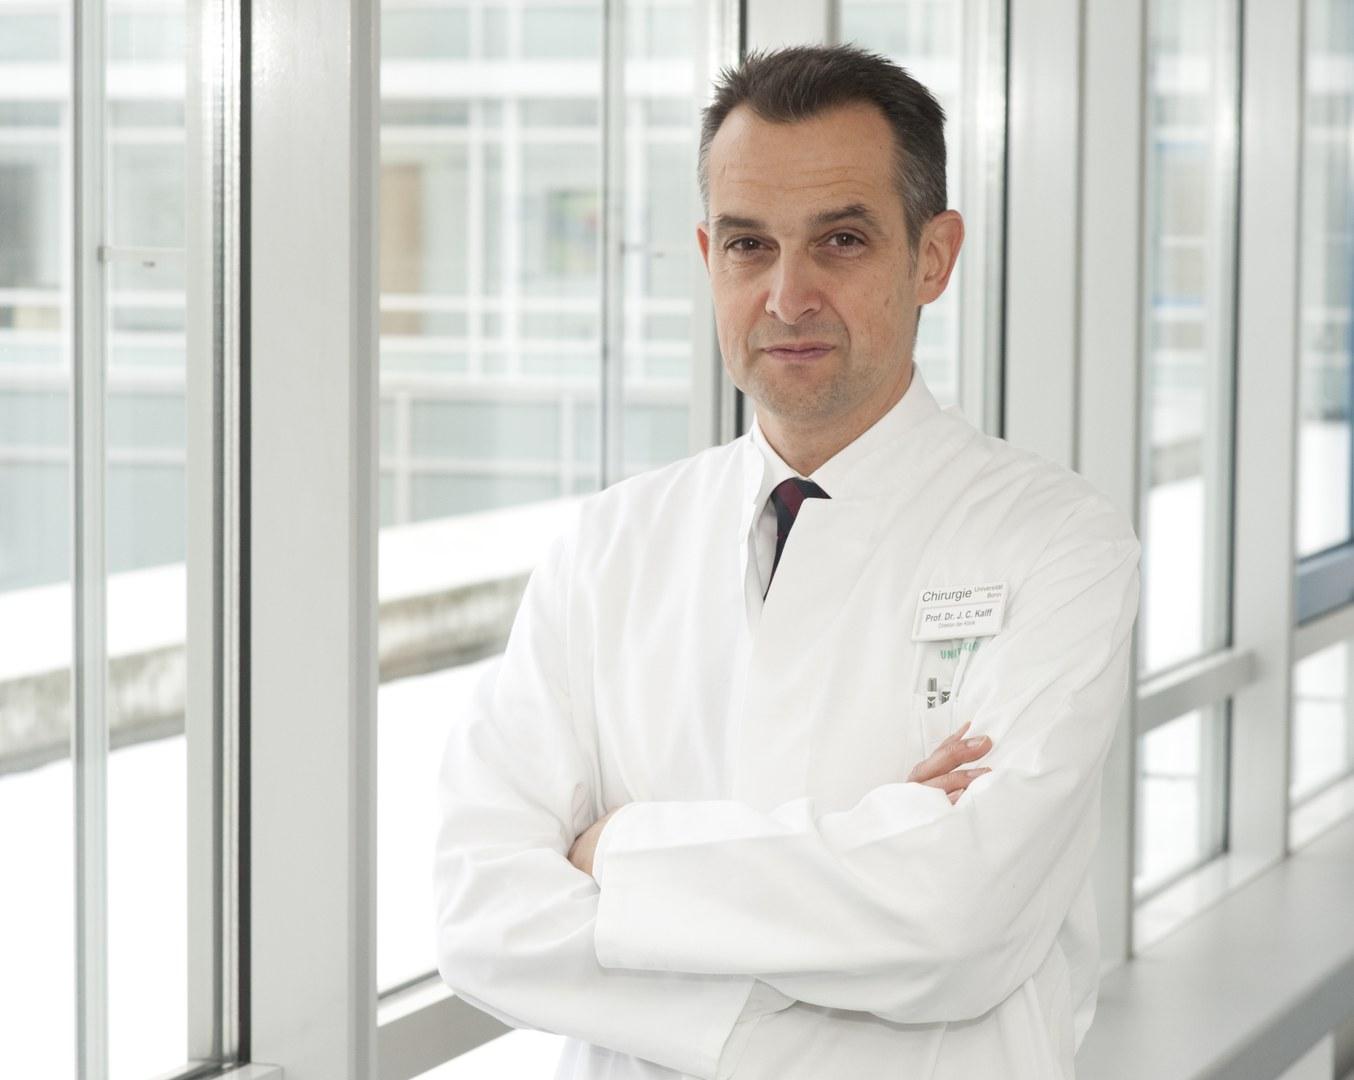 Professor Dr. Jörg Kalff